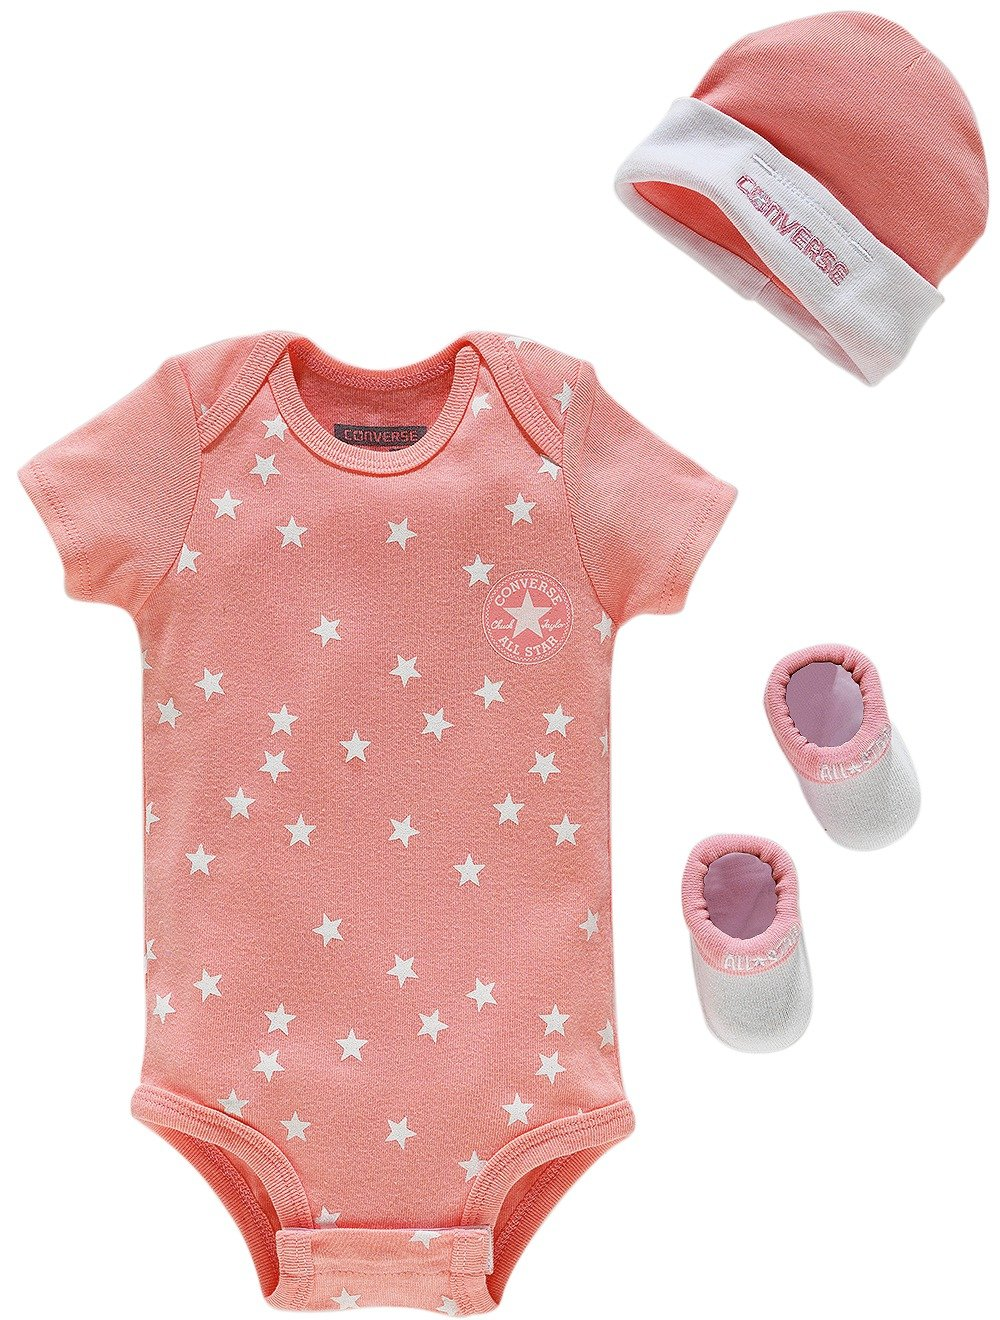 Image of Converse - Daybreak Pink Fashion Print - Gift Set - 0-6 Months